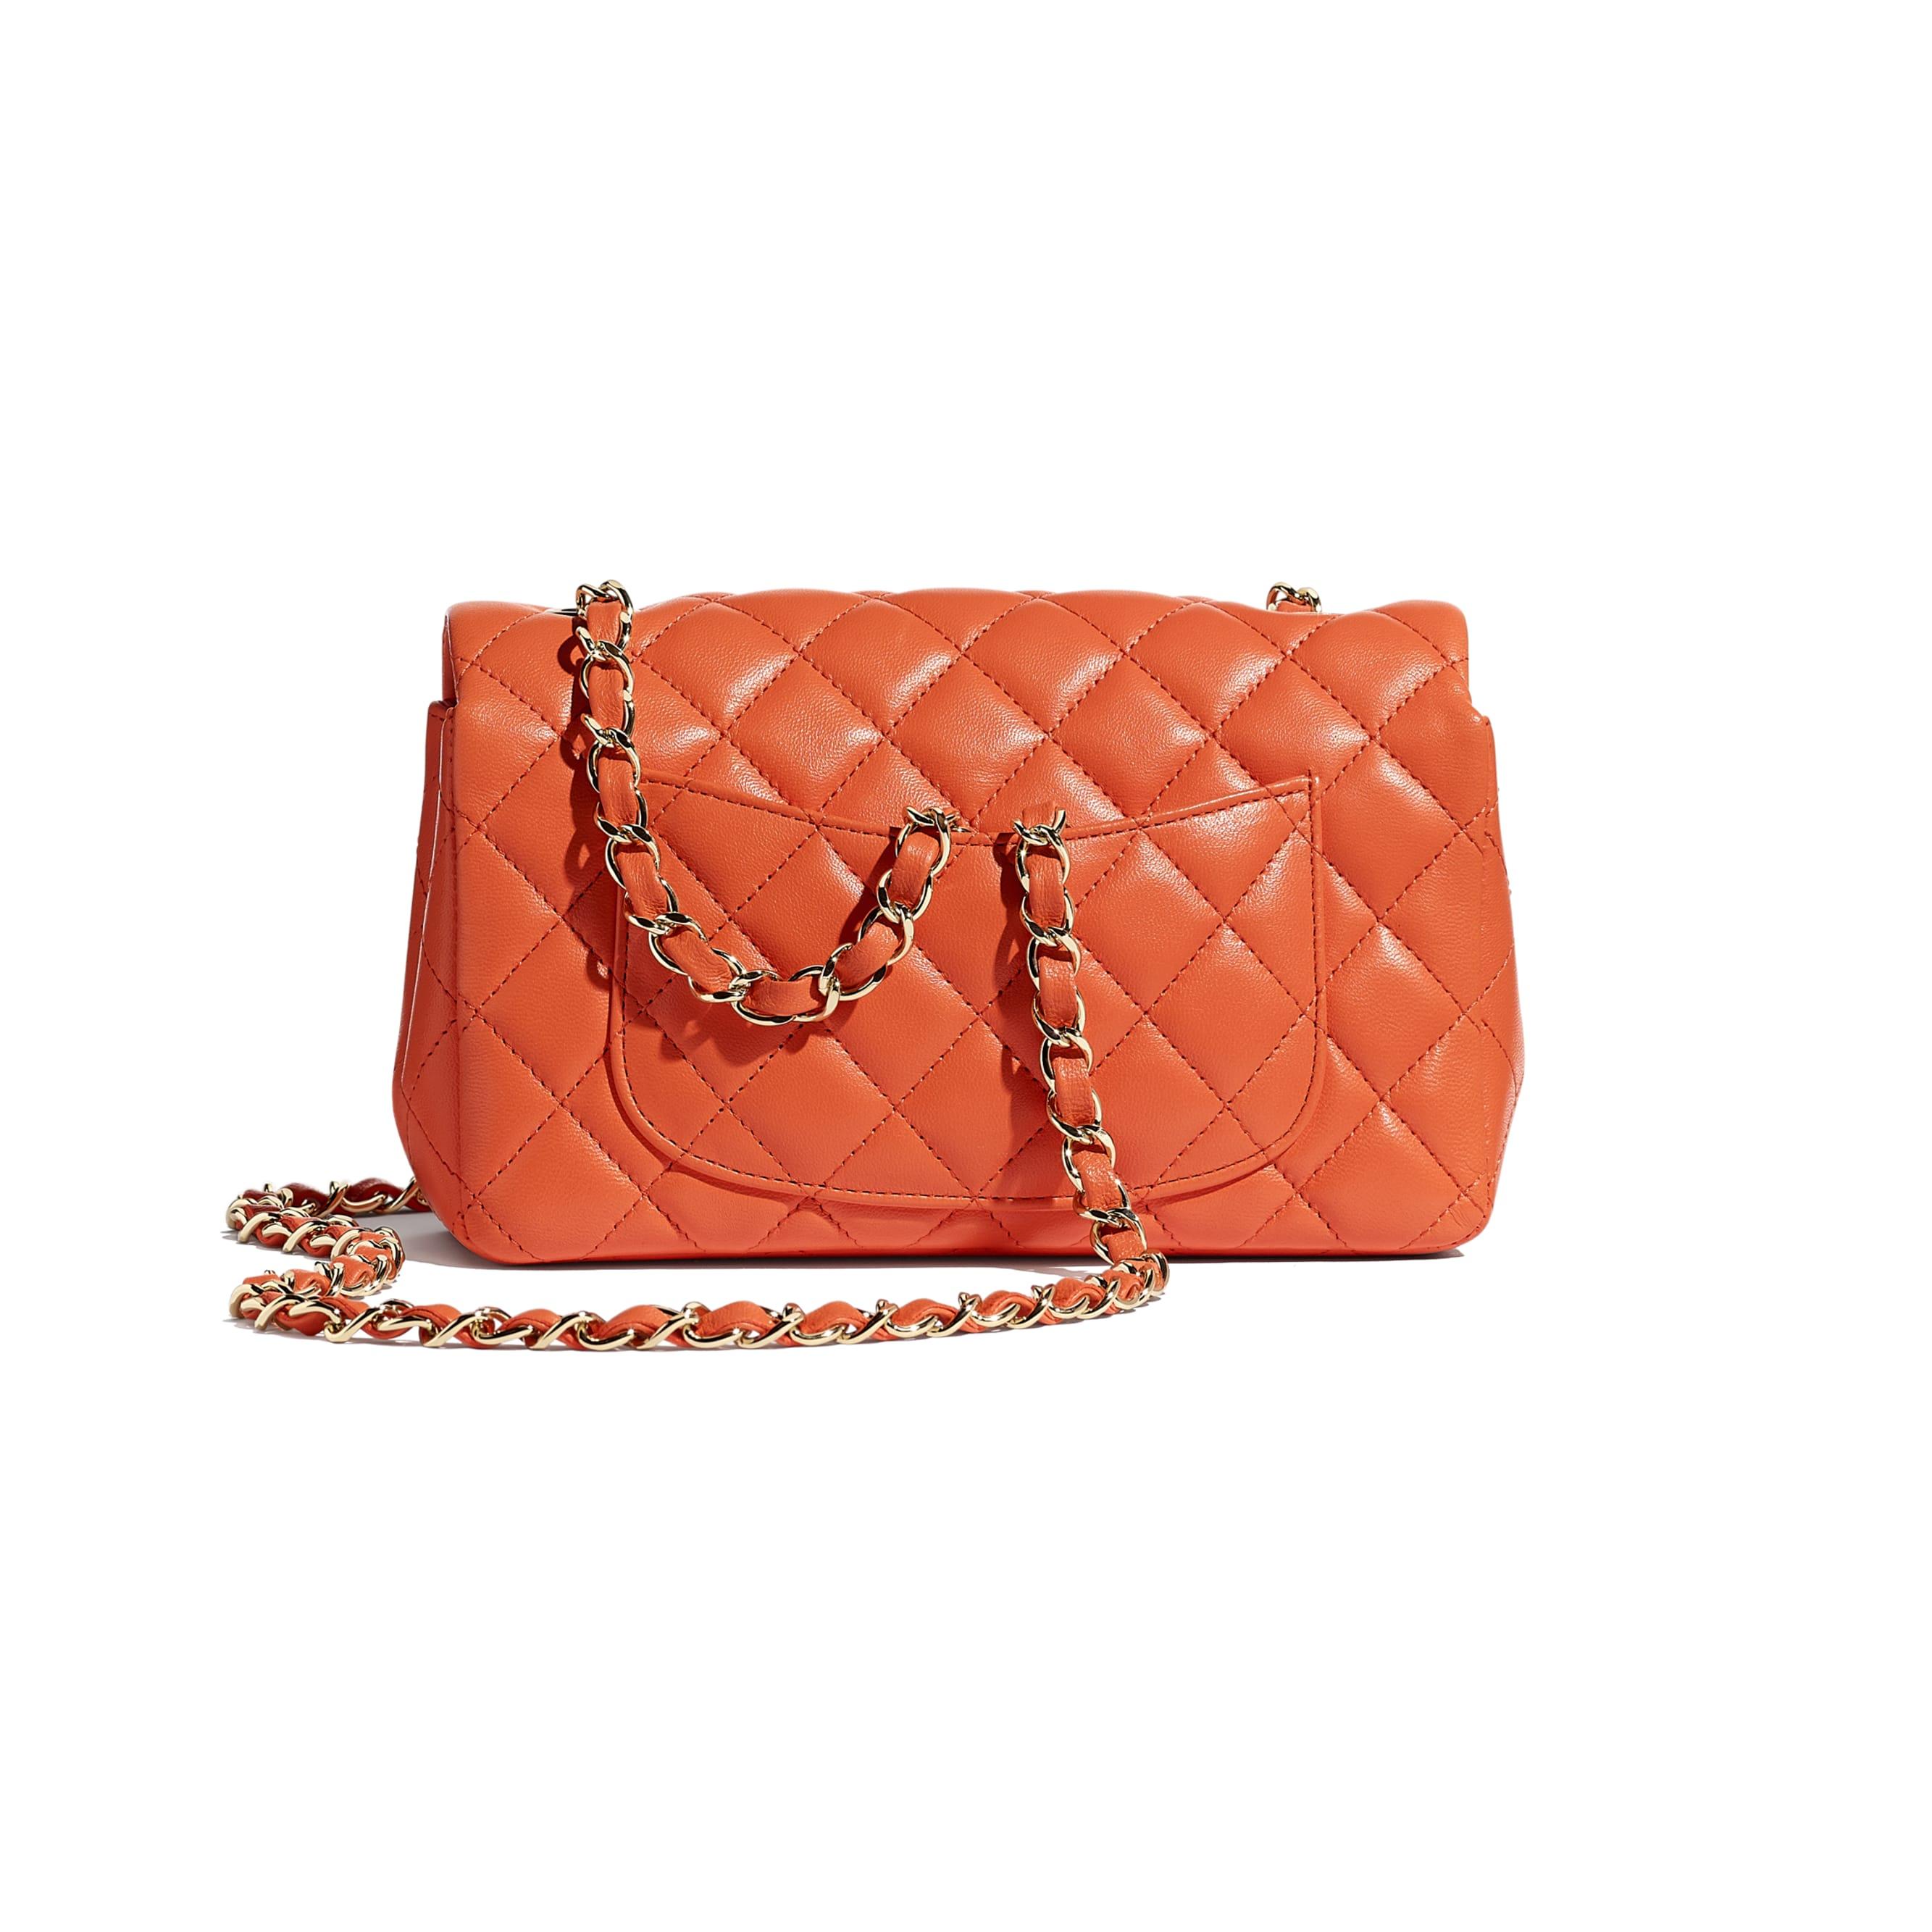 Mini Flap Bag - Orange - Lambskin & Gold-Tone Metal - CHANEL - Alternative view - see standard sized version